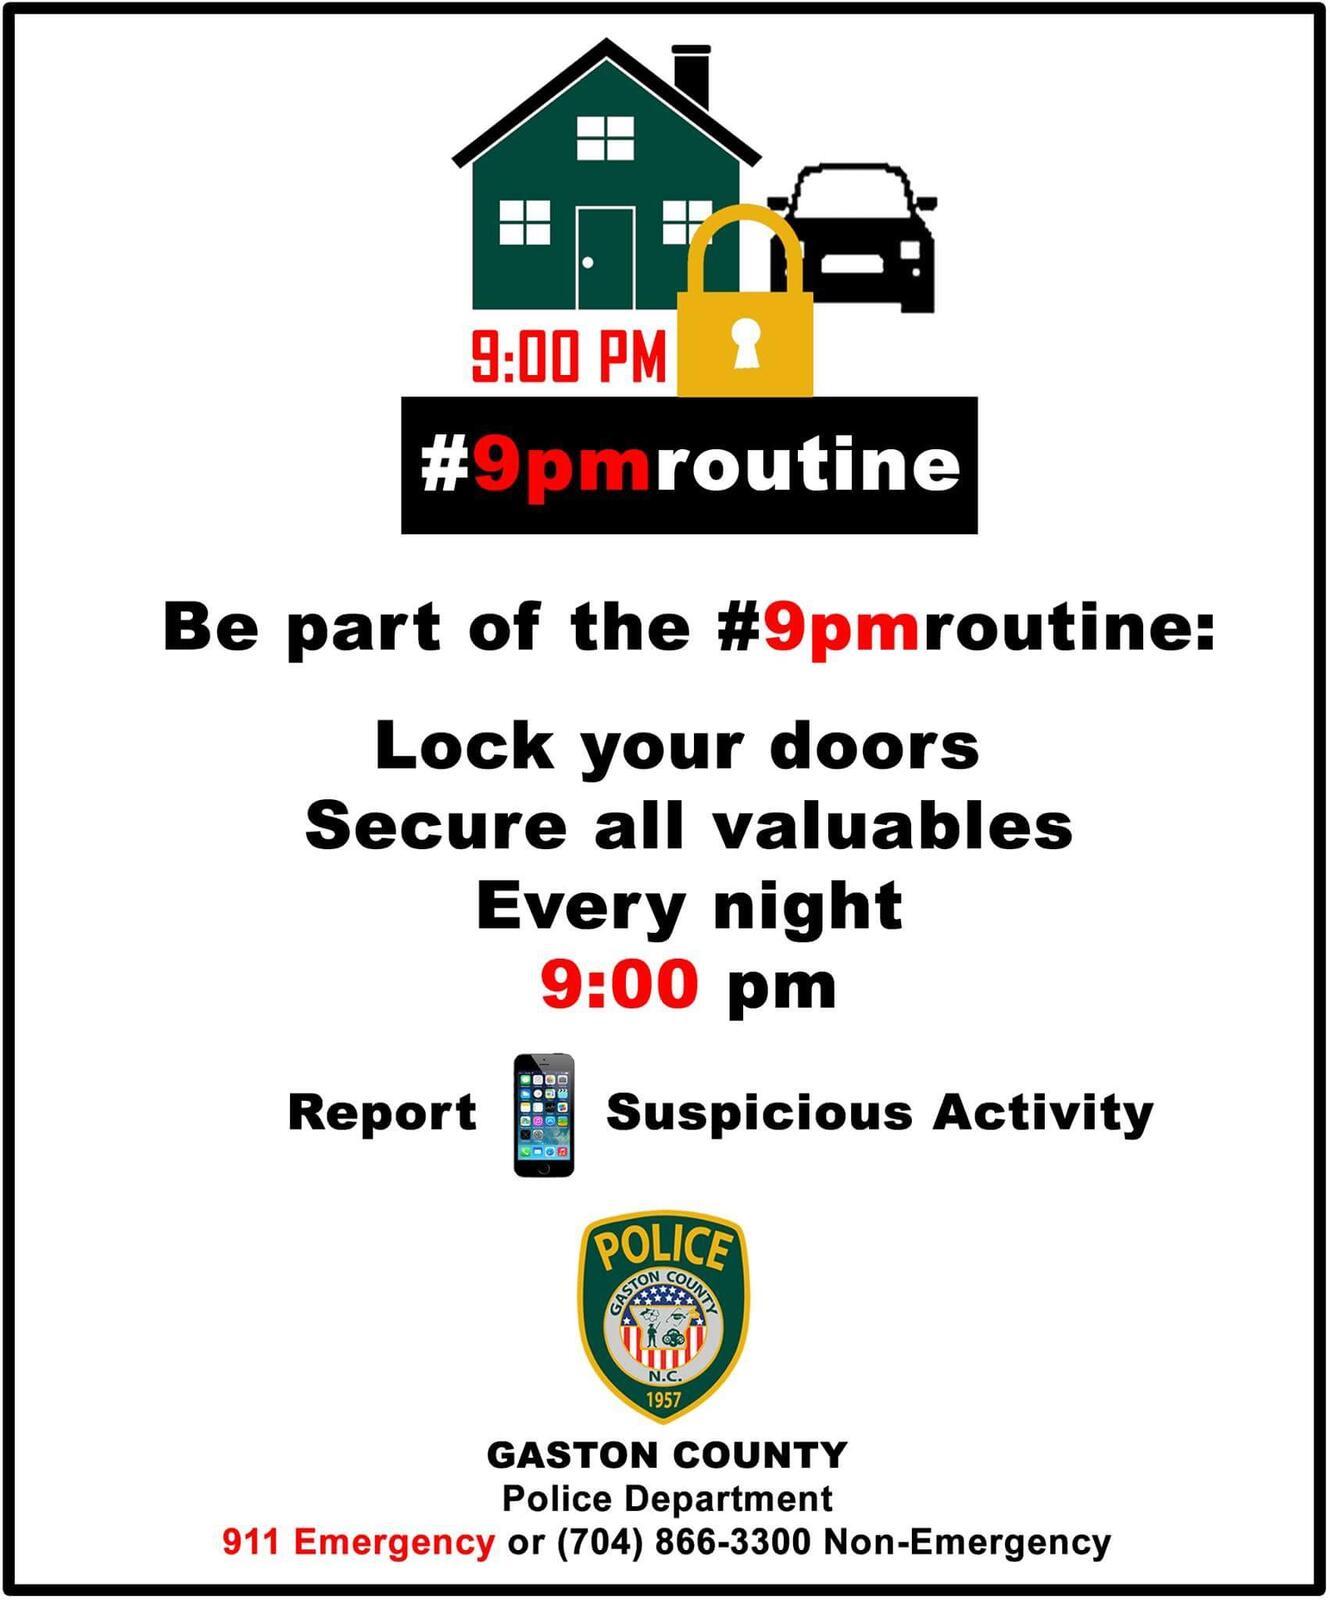 9pmroutine (Gaston County Police Department) &mdash